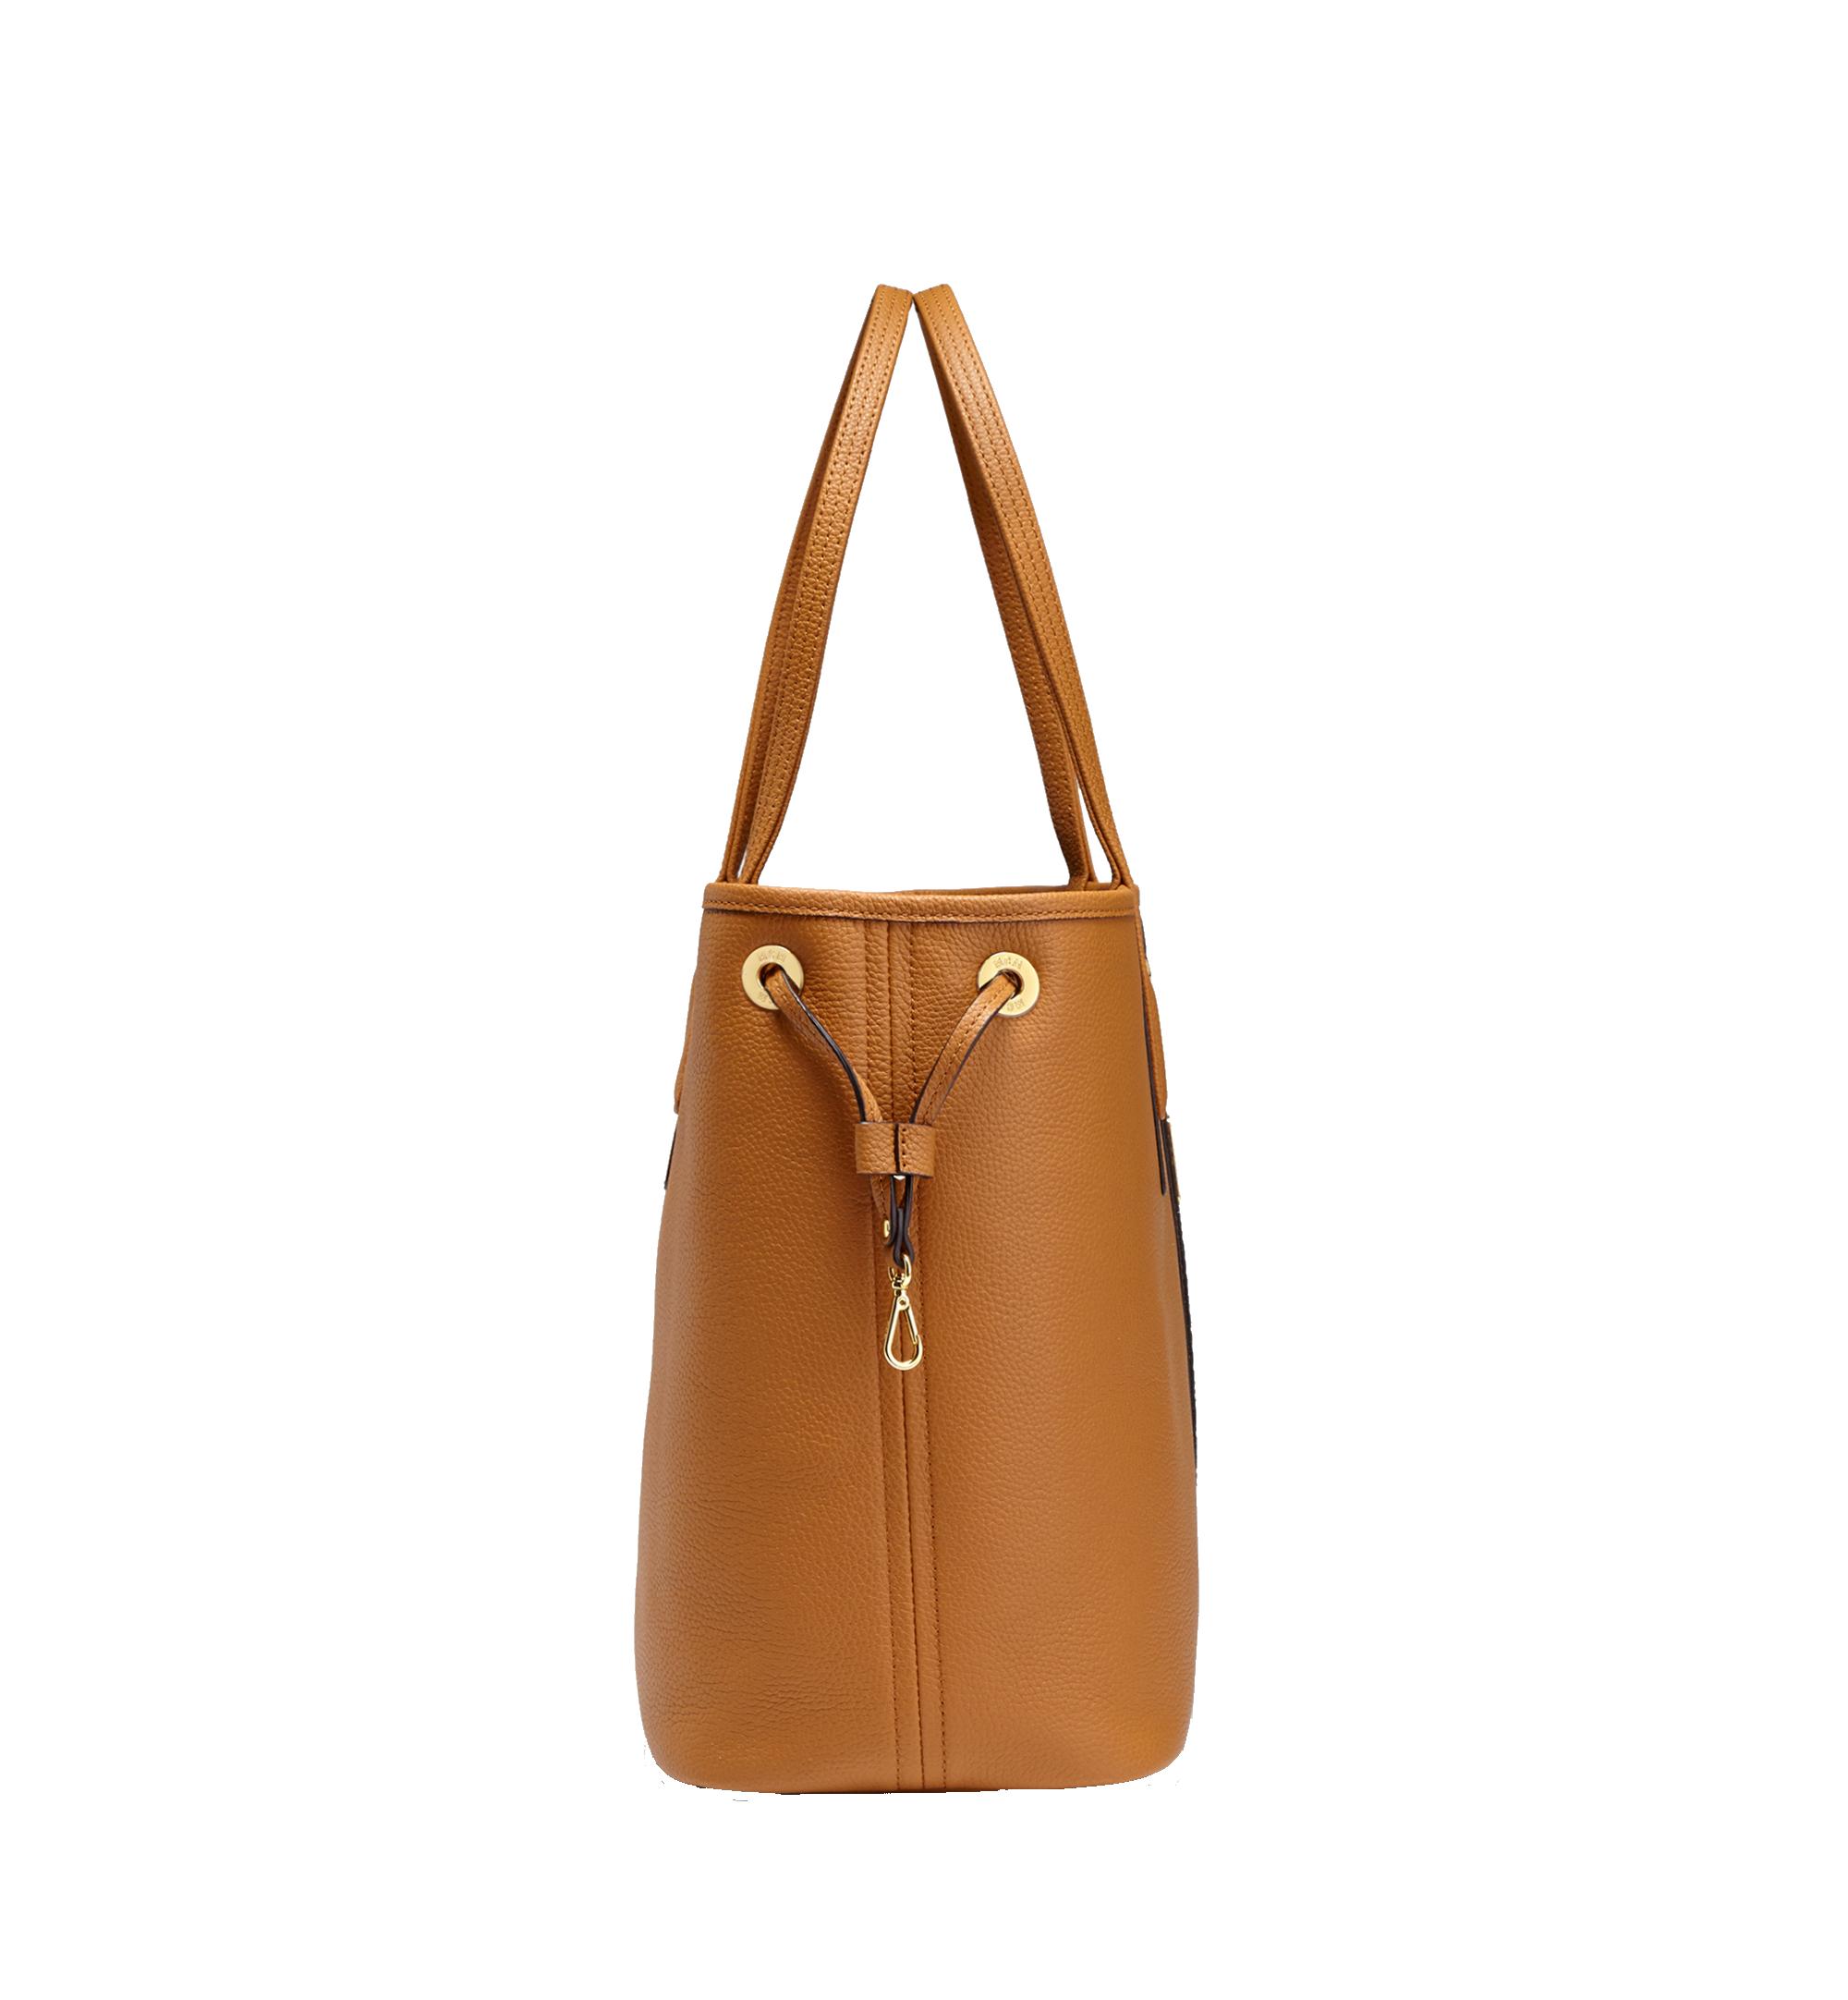 Medium Reversible Liz Shopper in Leather Cognac | MCM® DE